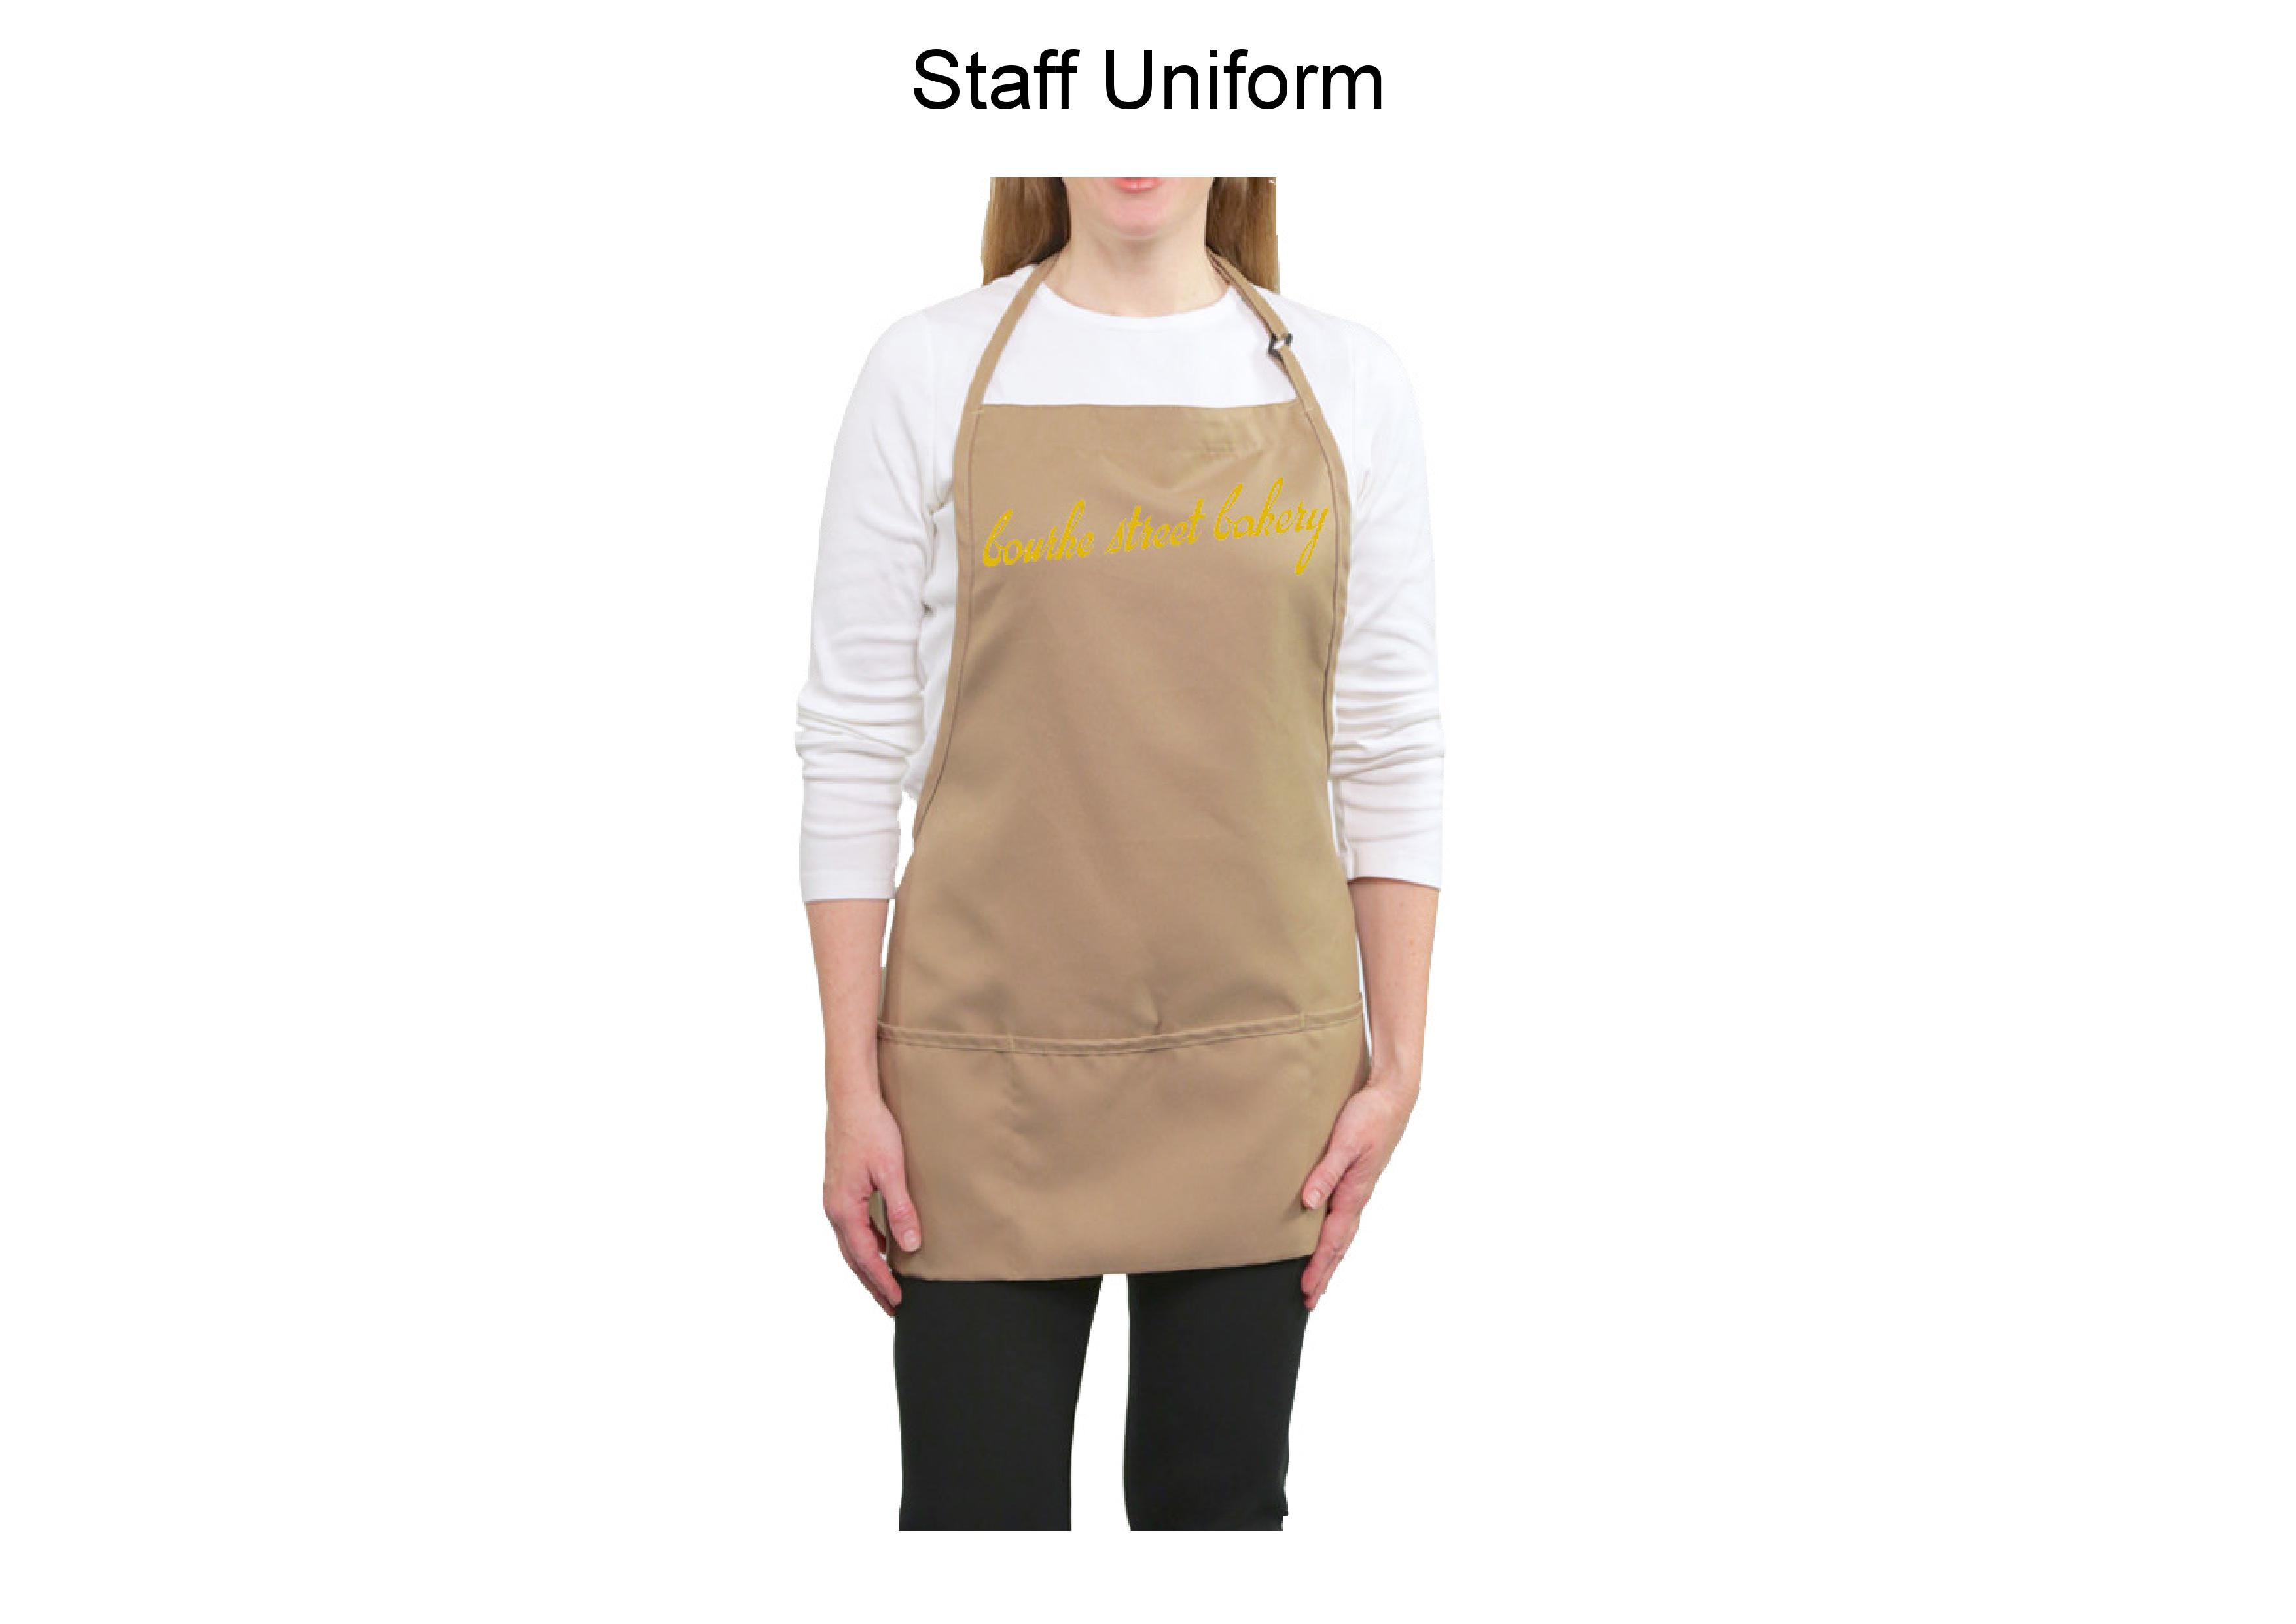 New Uniform - Branding